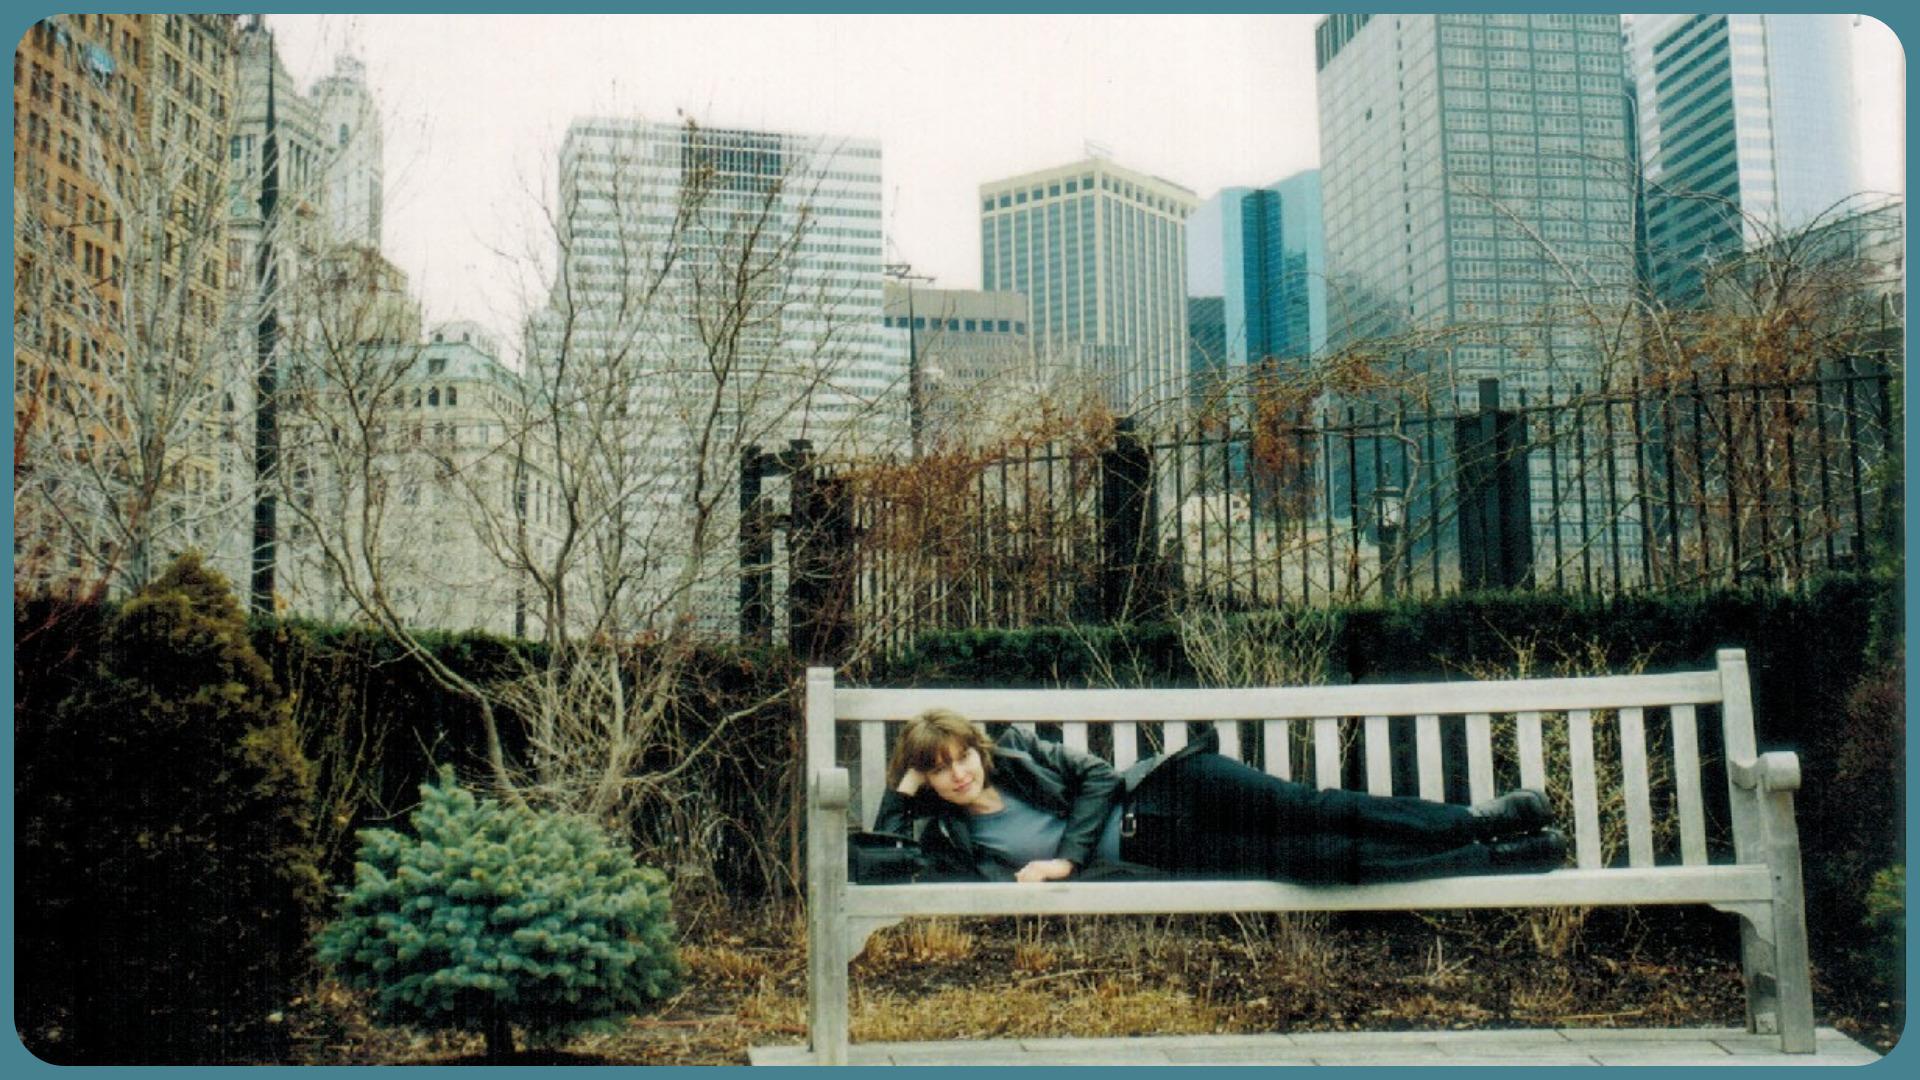 Нью-Йорк 2001. Фото motherware Екатерина Широкова, shiro-kino.ru